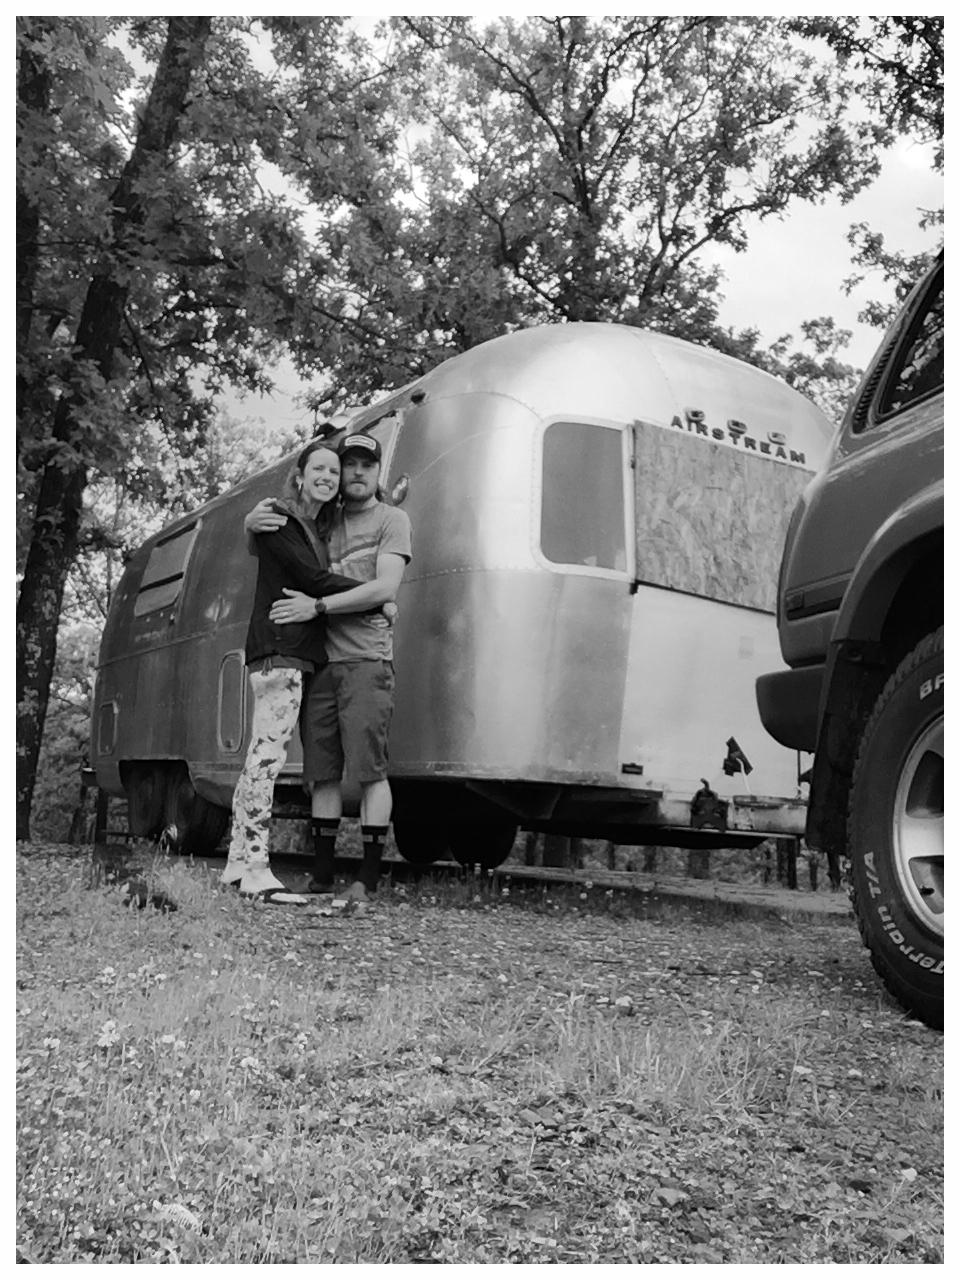 Campsite in Oklahoma